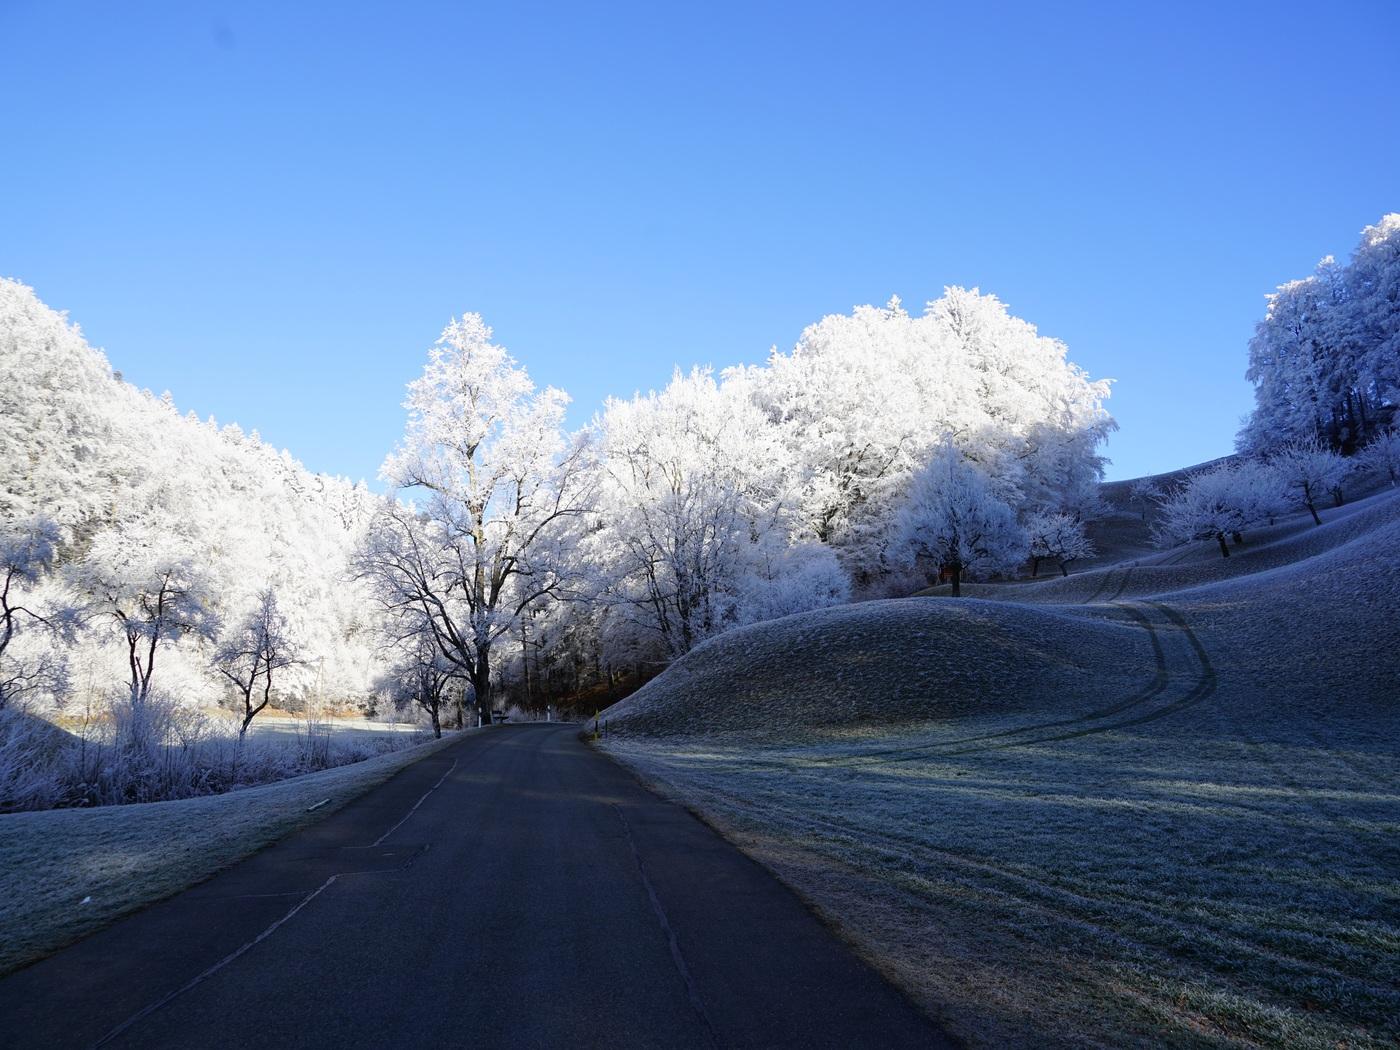 hill-frost-road-trees-8k-g1.jpg